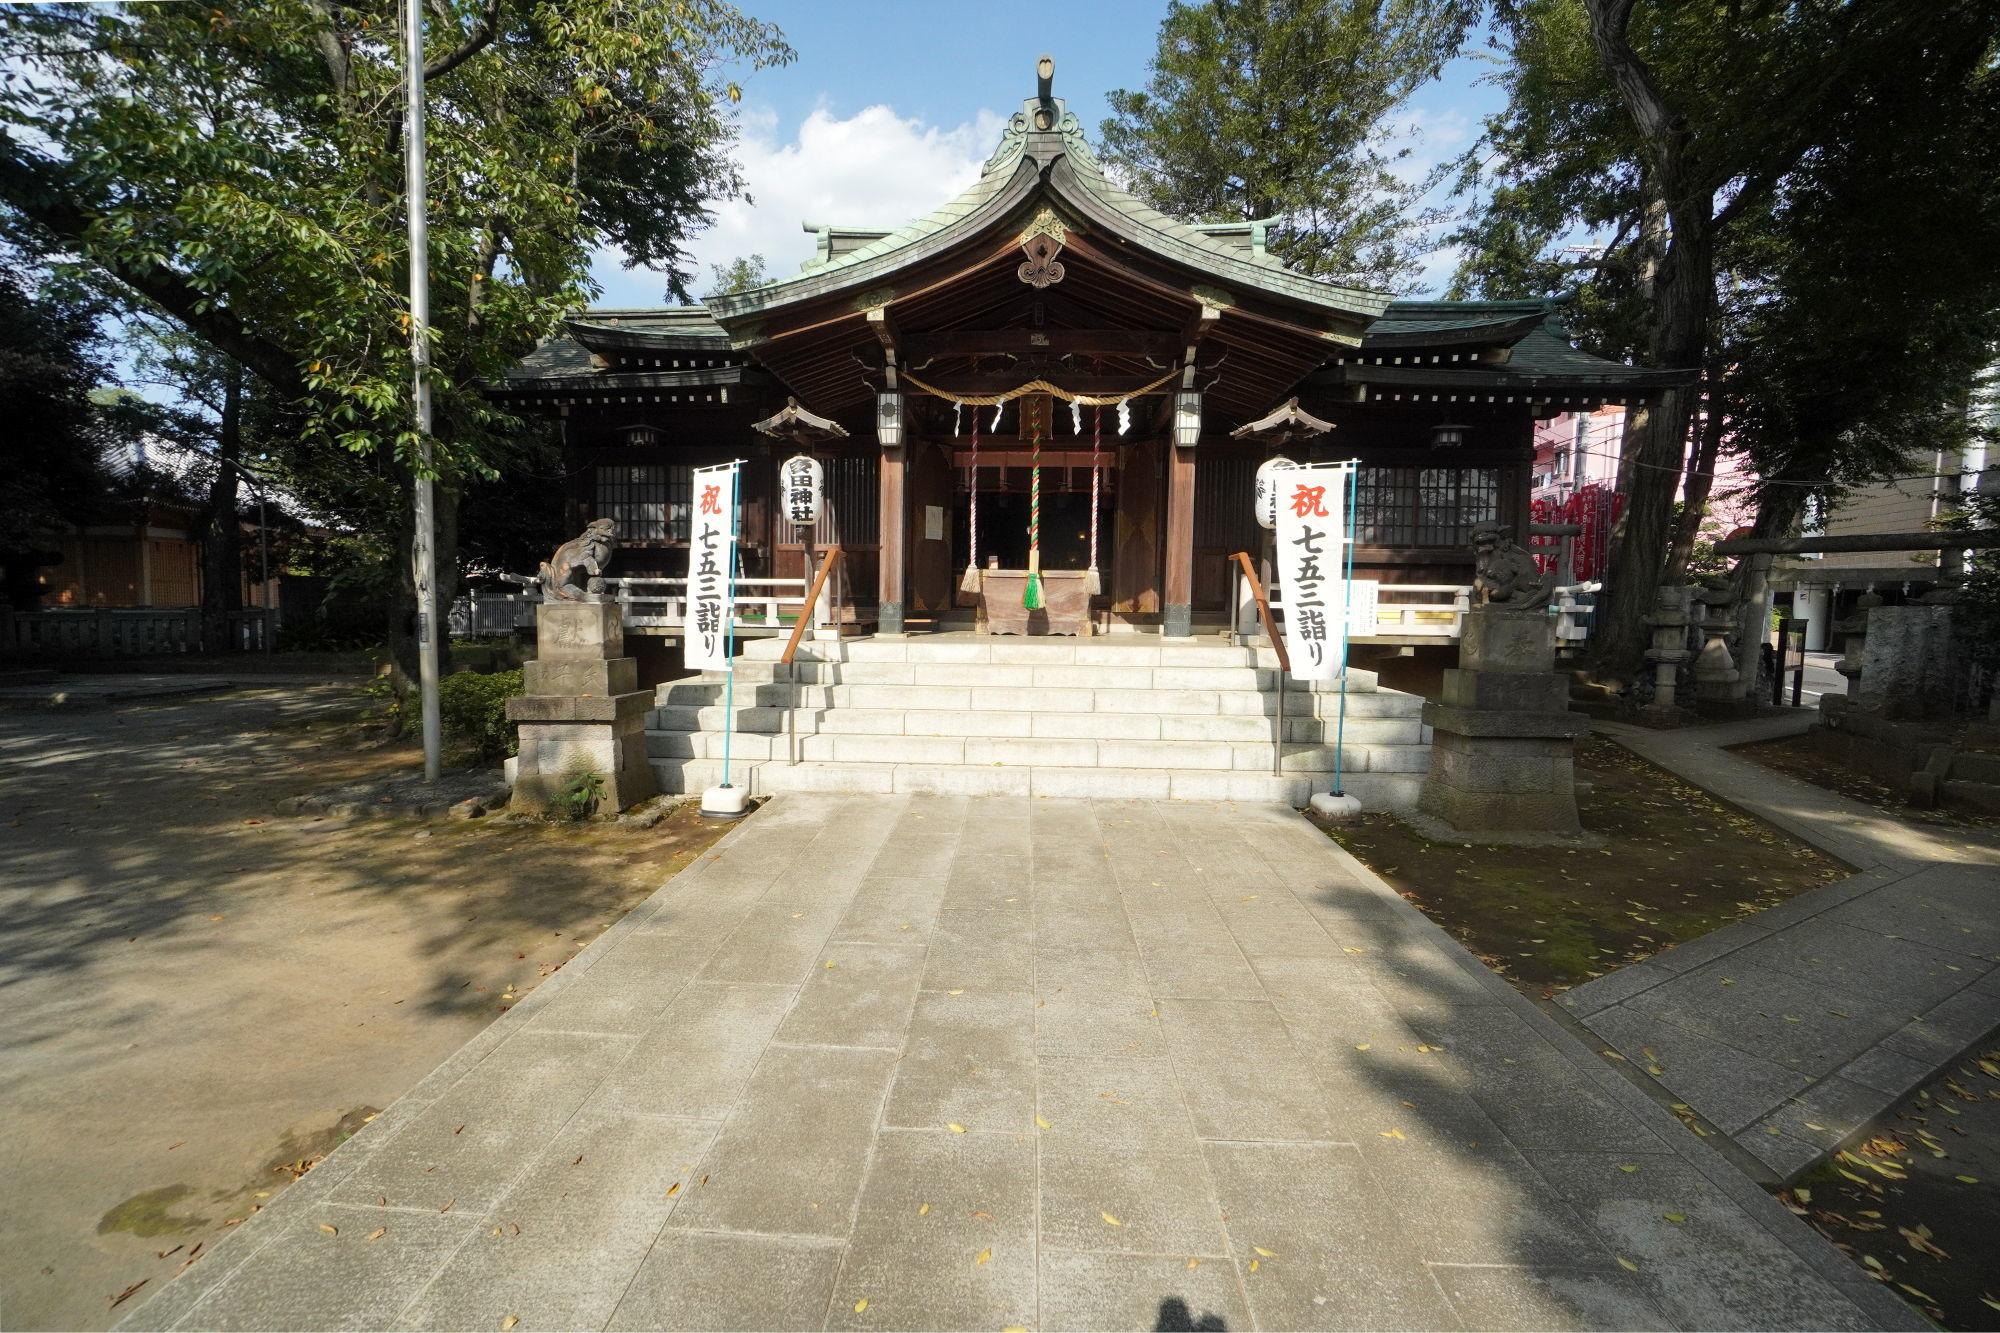 多田神社の拝殿